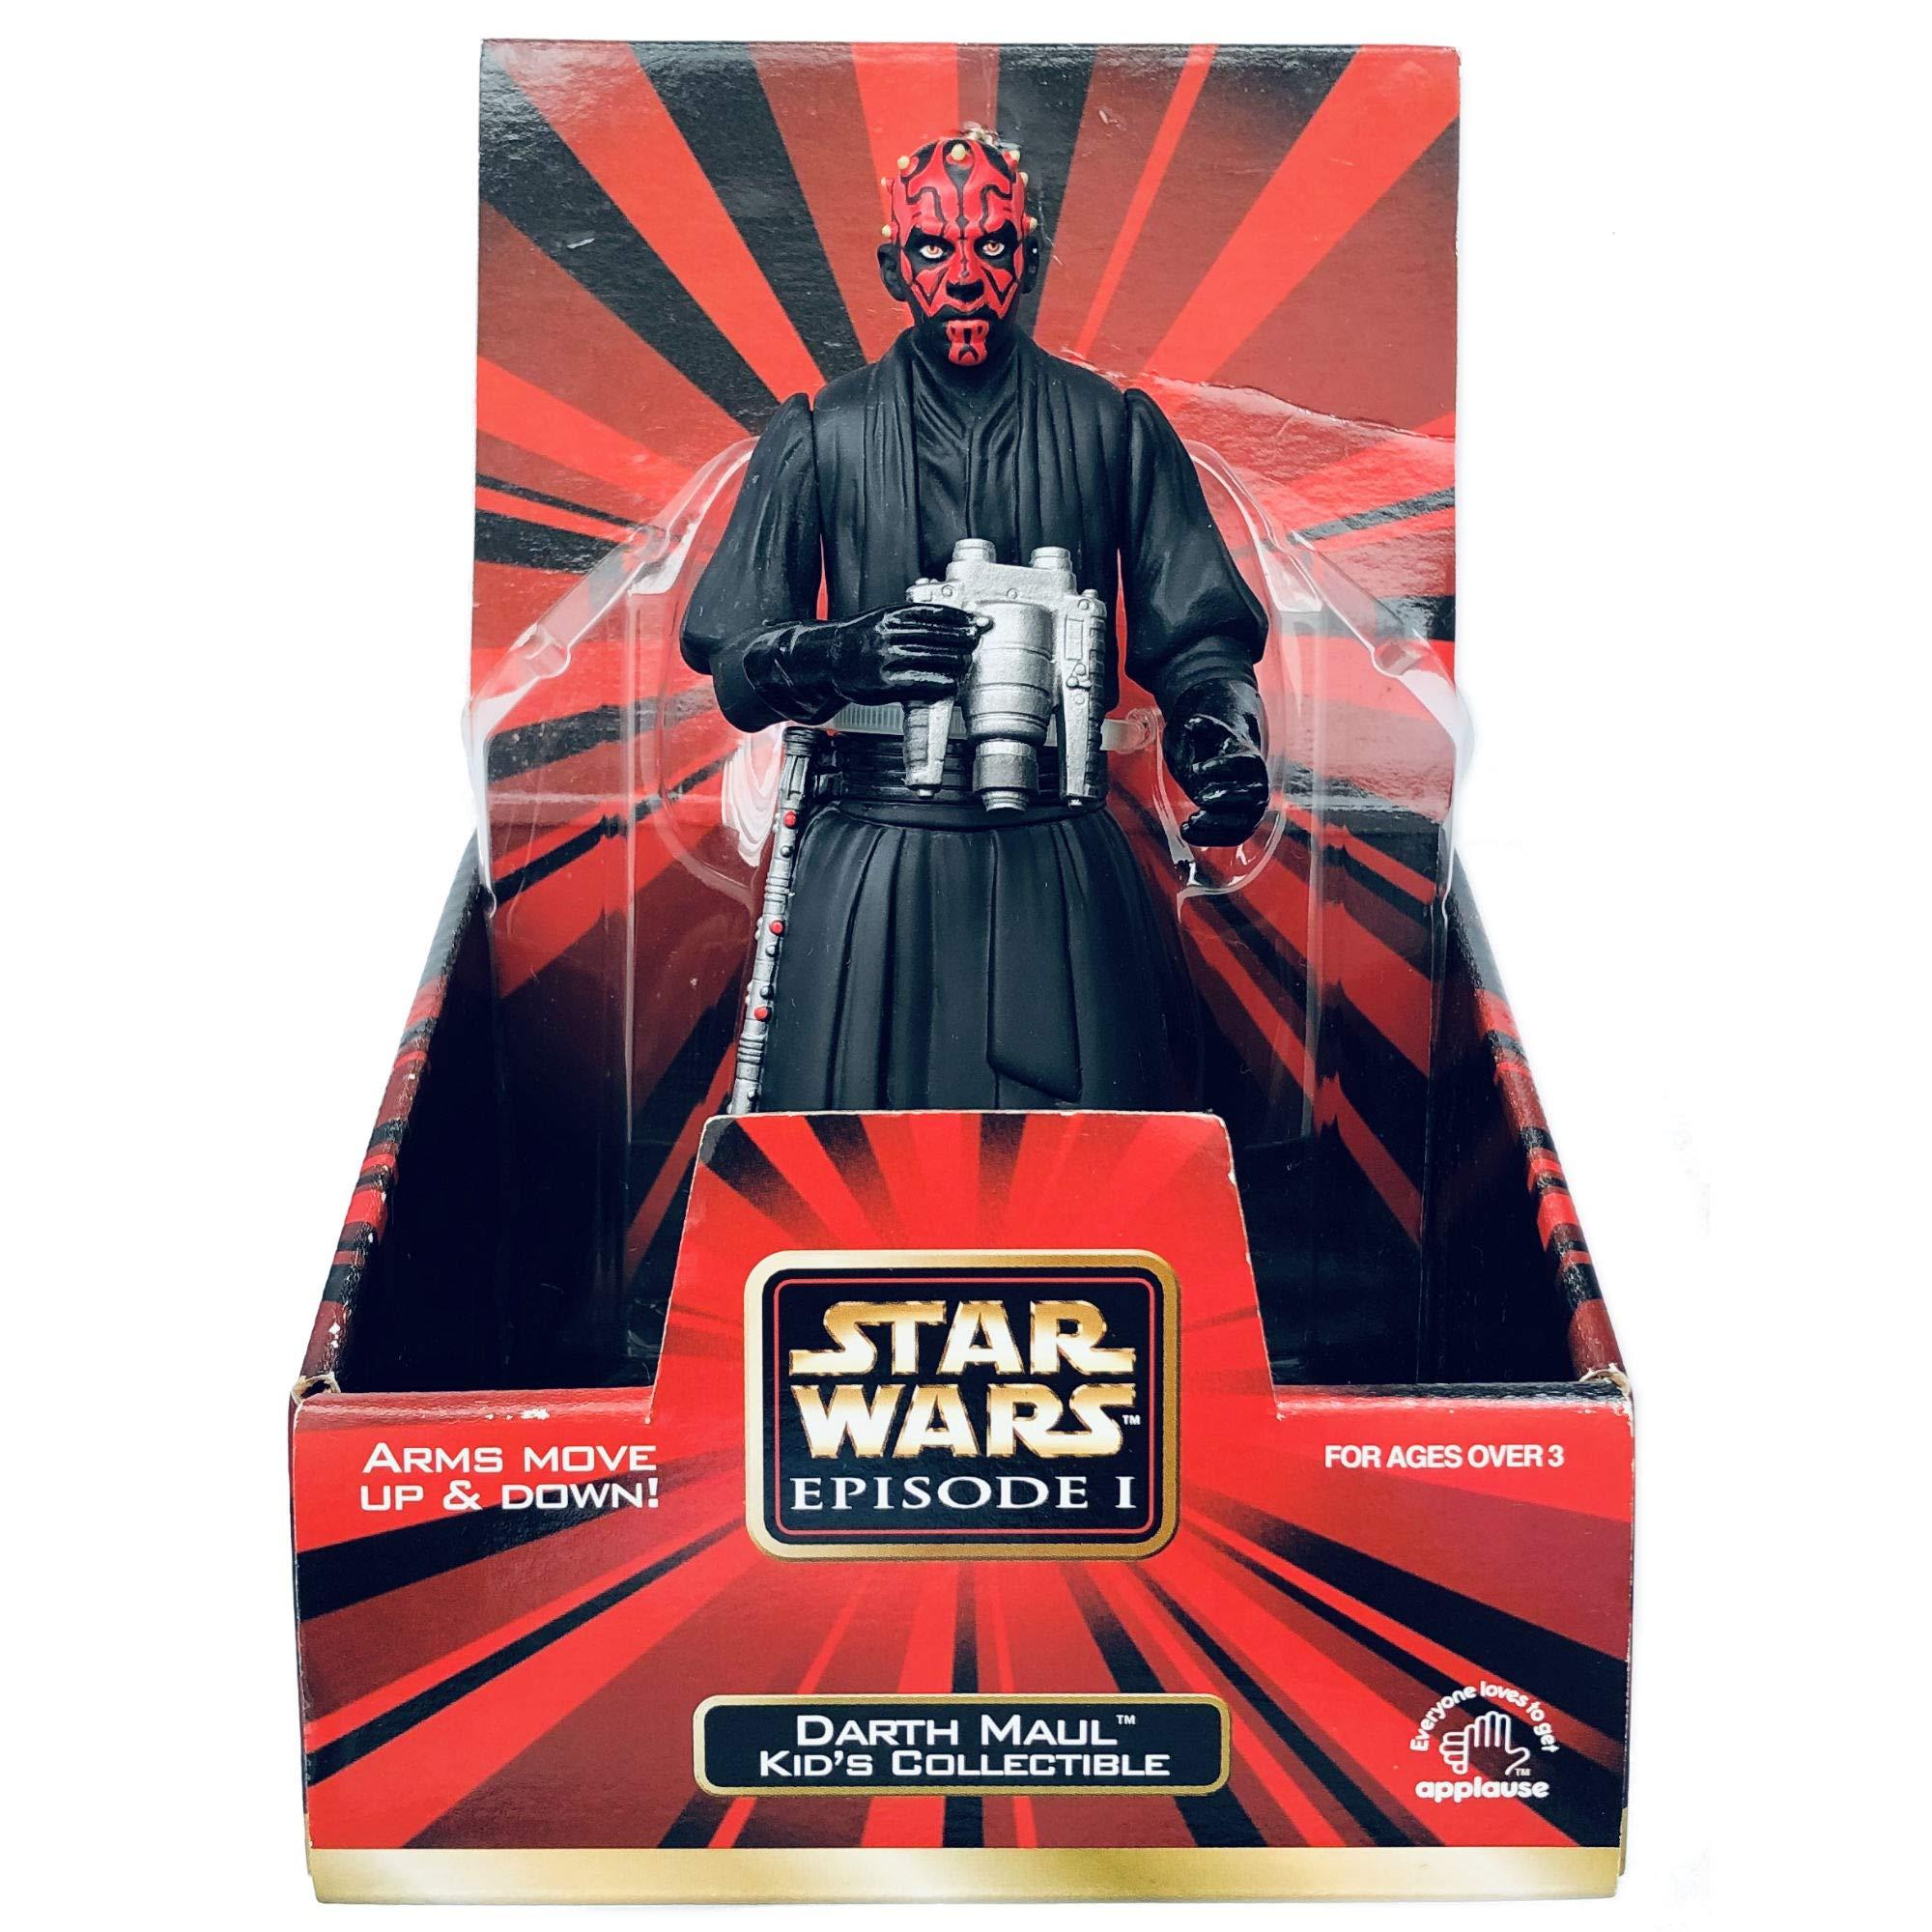 Applause Star Wars Darth Maul 6-Inch Action Figure